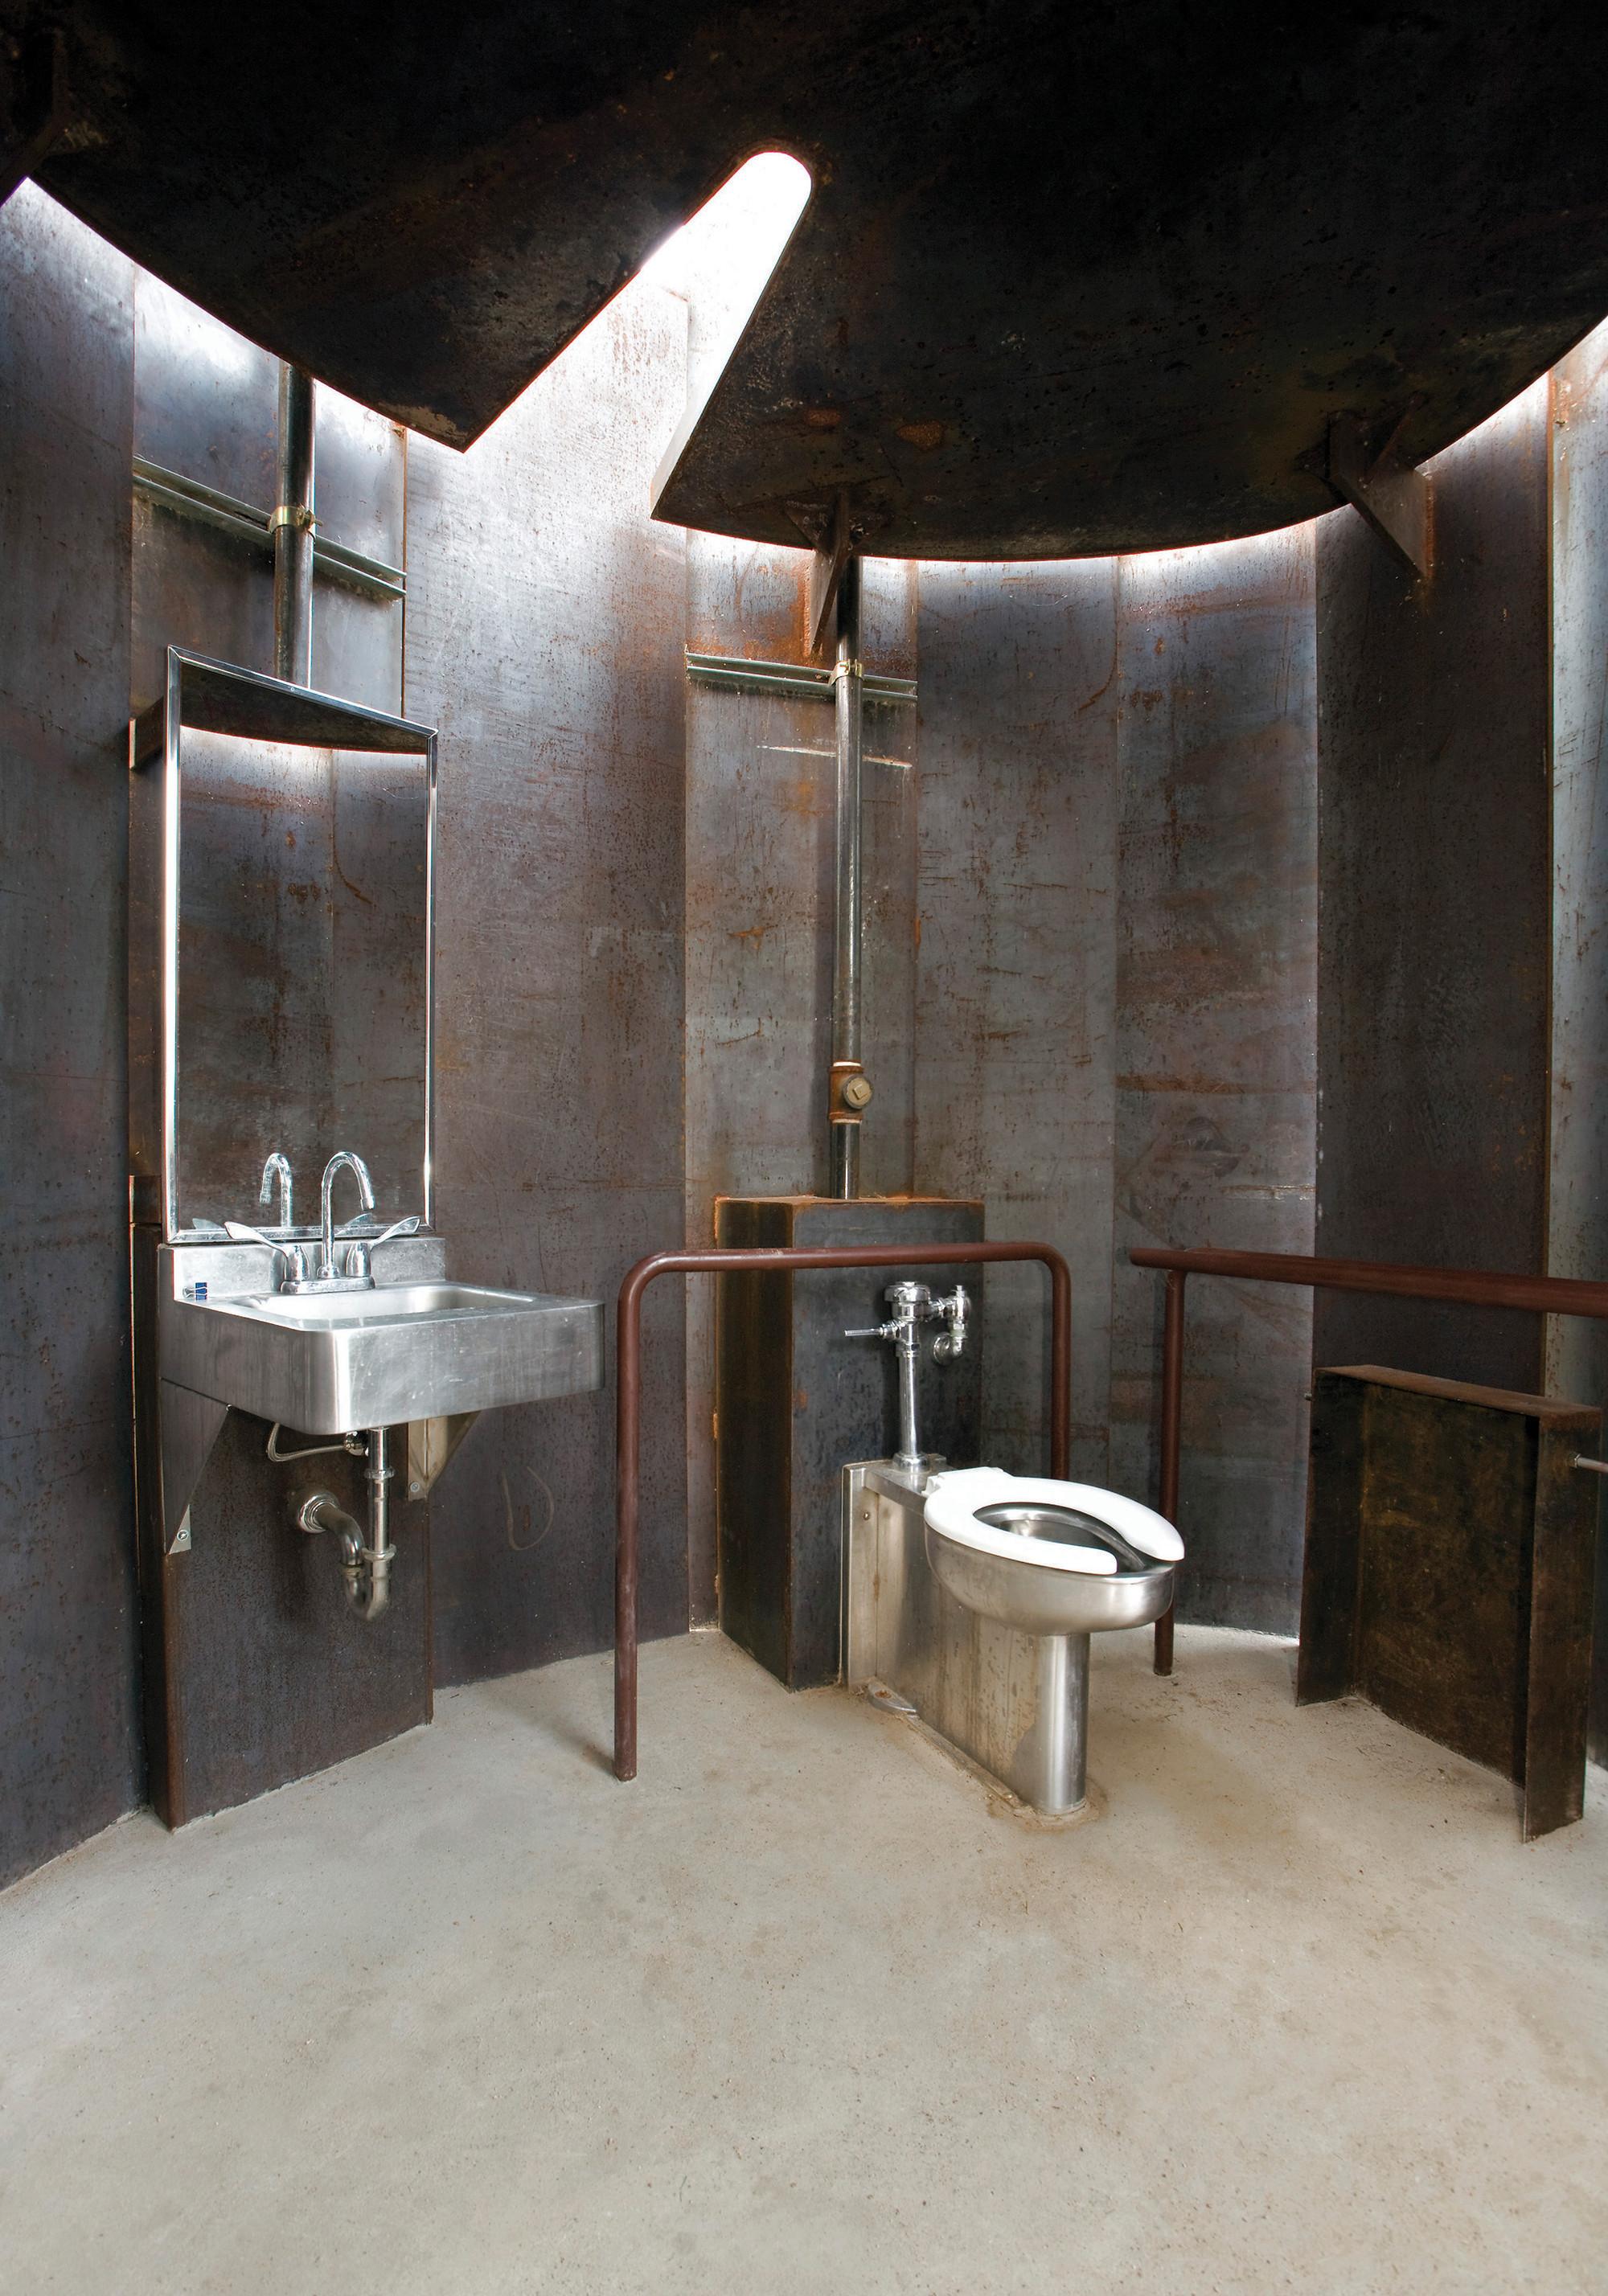 Galeria de Banheiro Público / Miro Rivera Architects 4 #756756 2000 2856